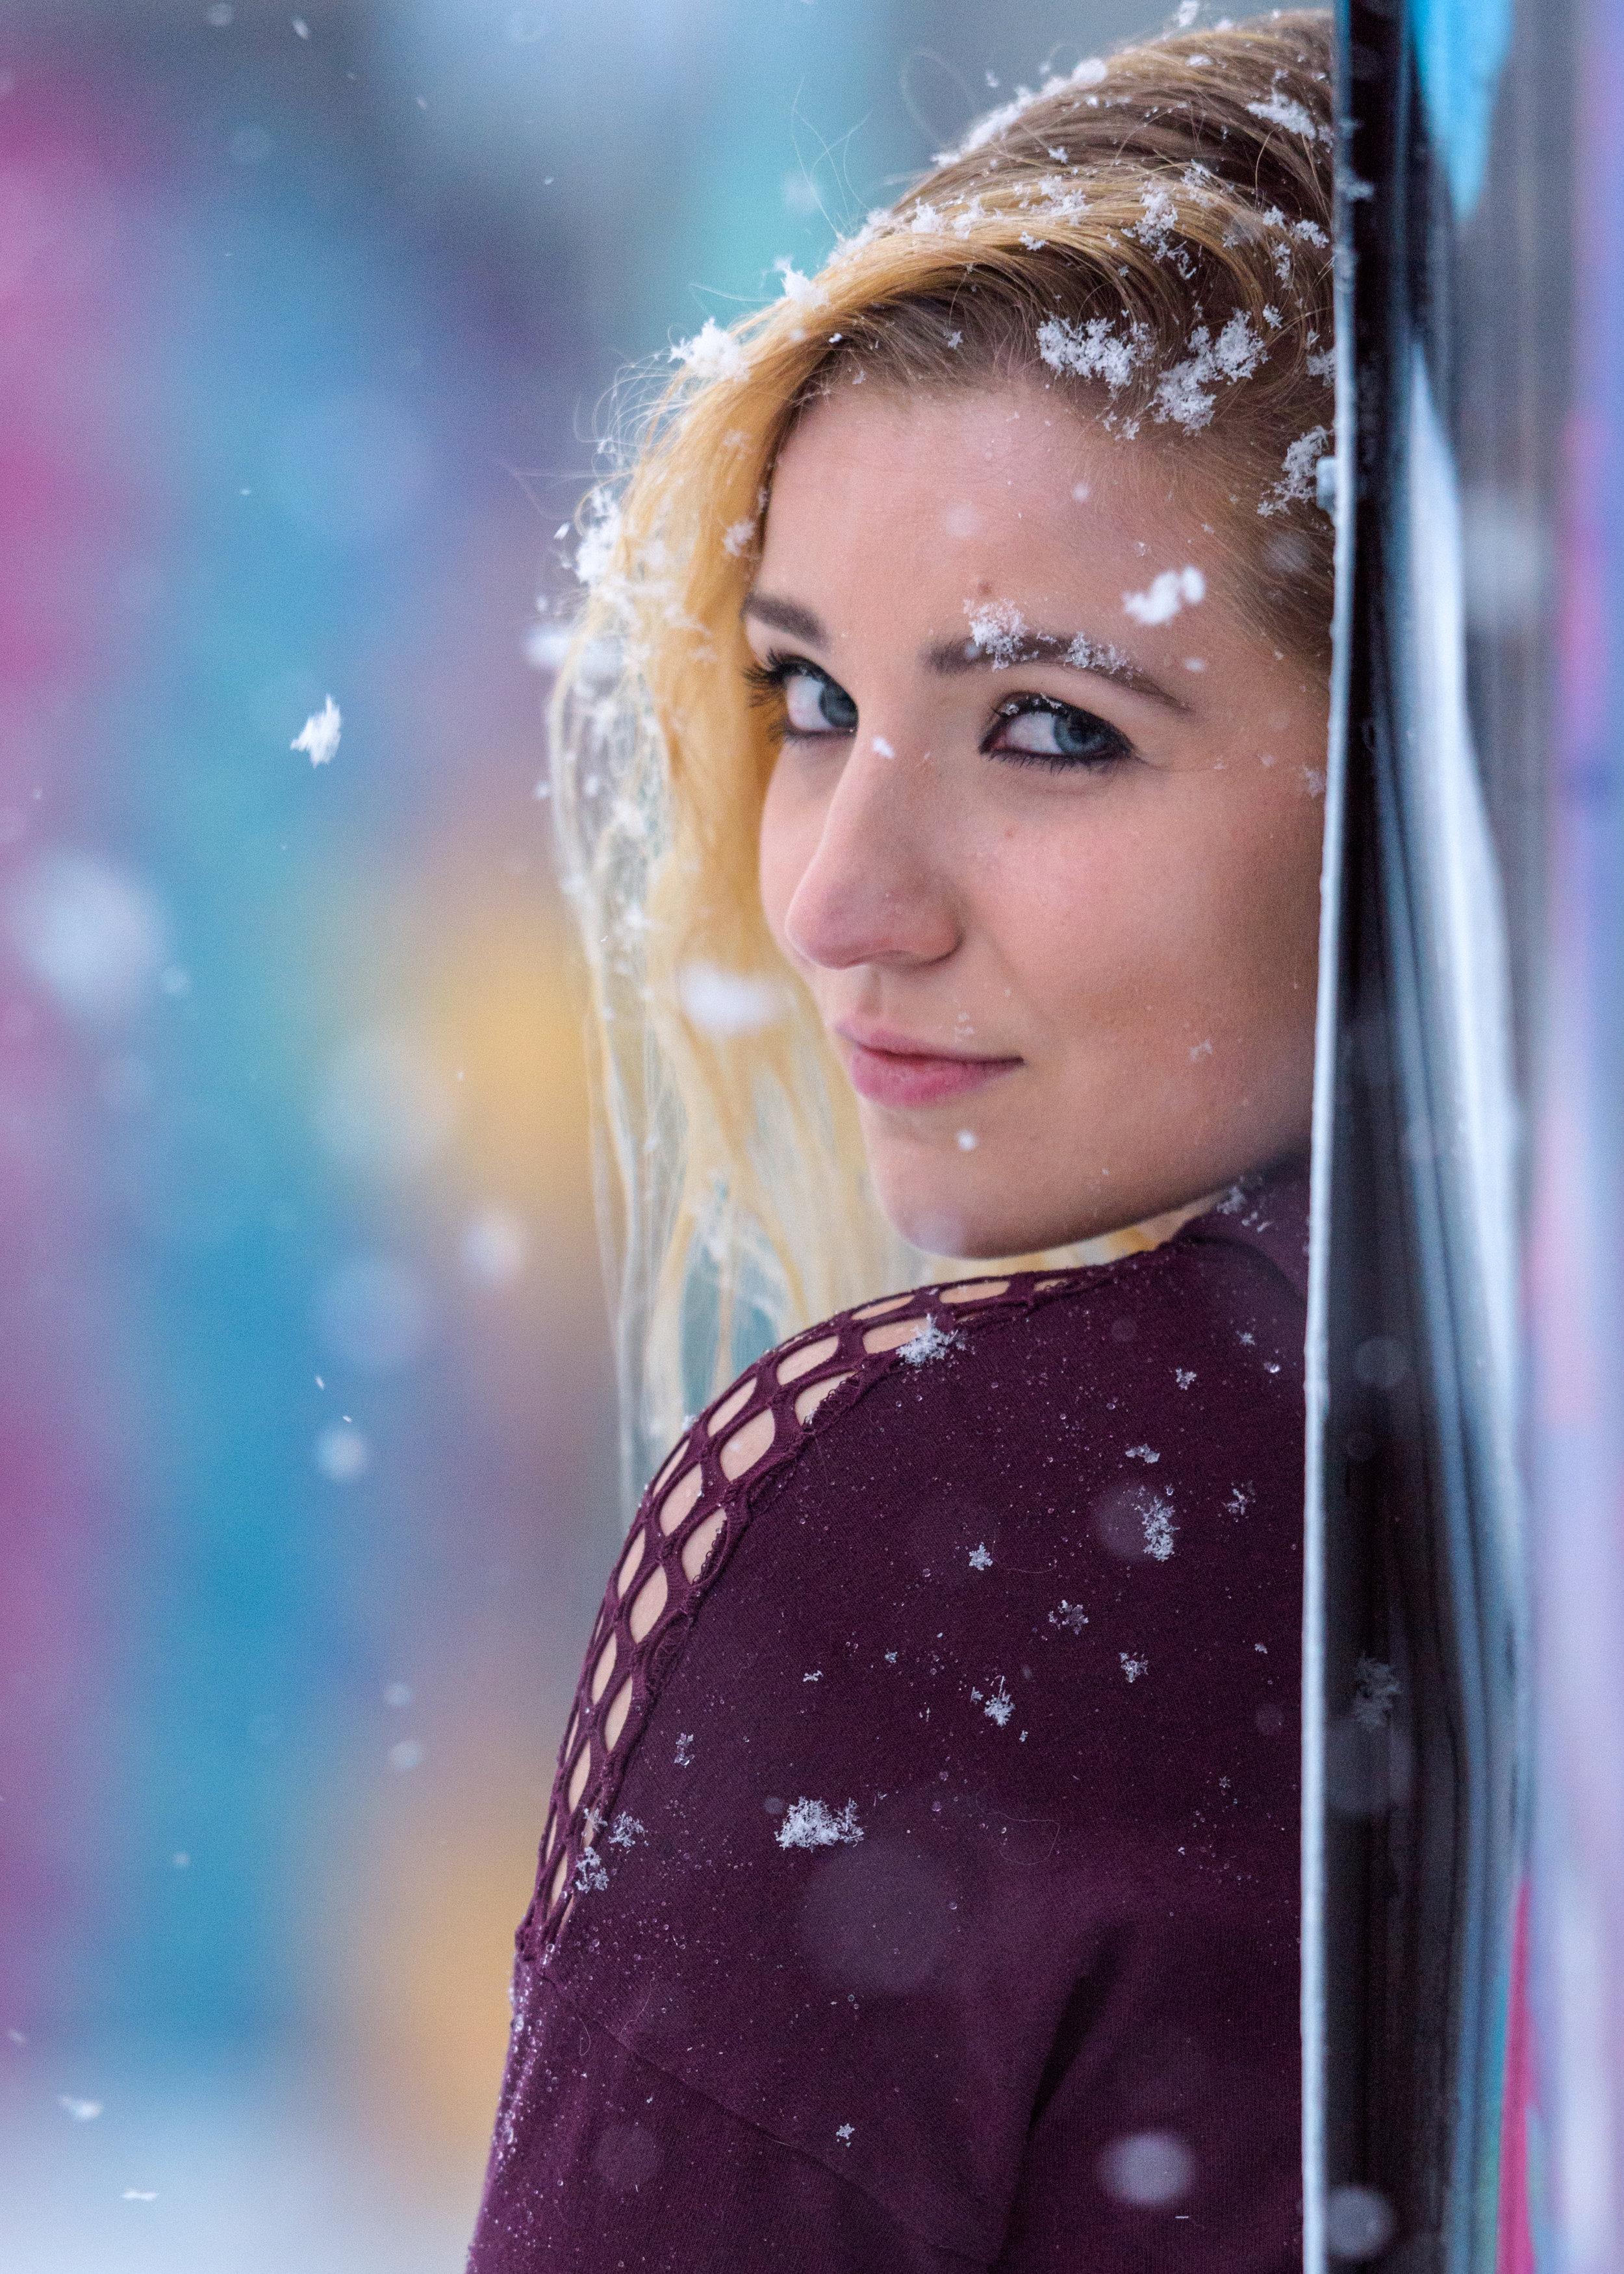 Kaereilly Snow Shoot_ (31).jpg